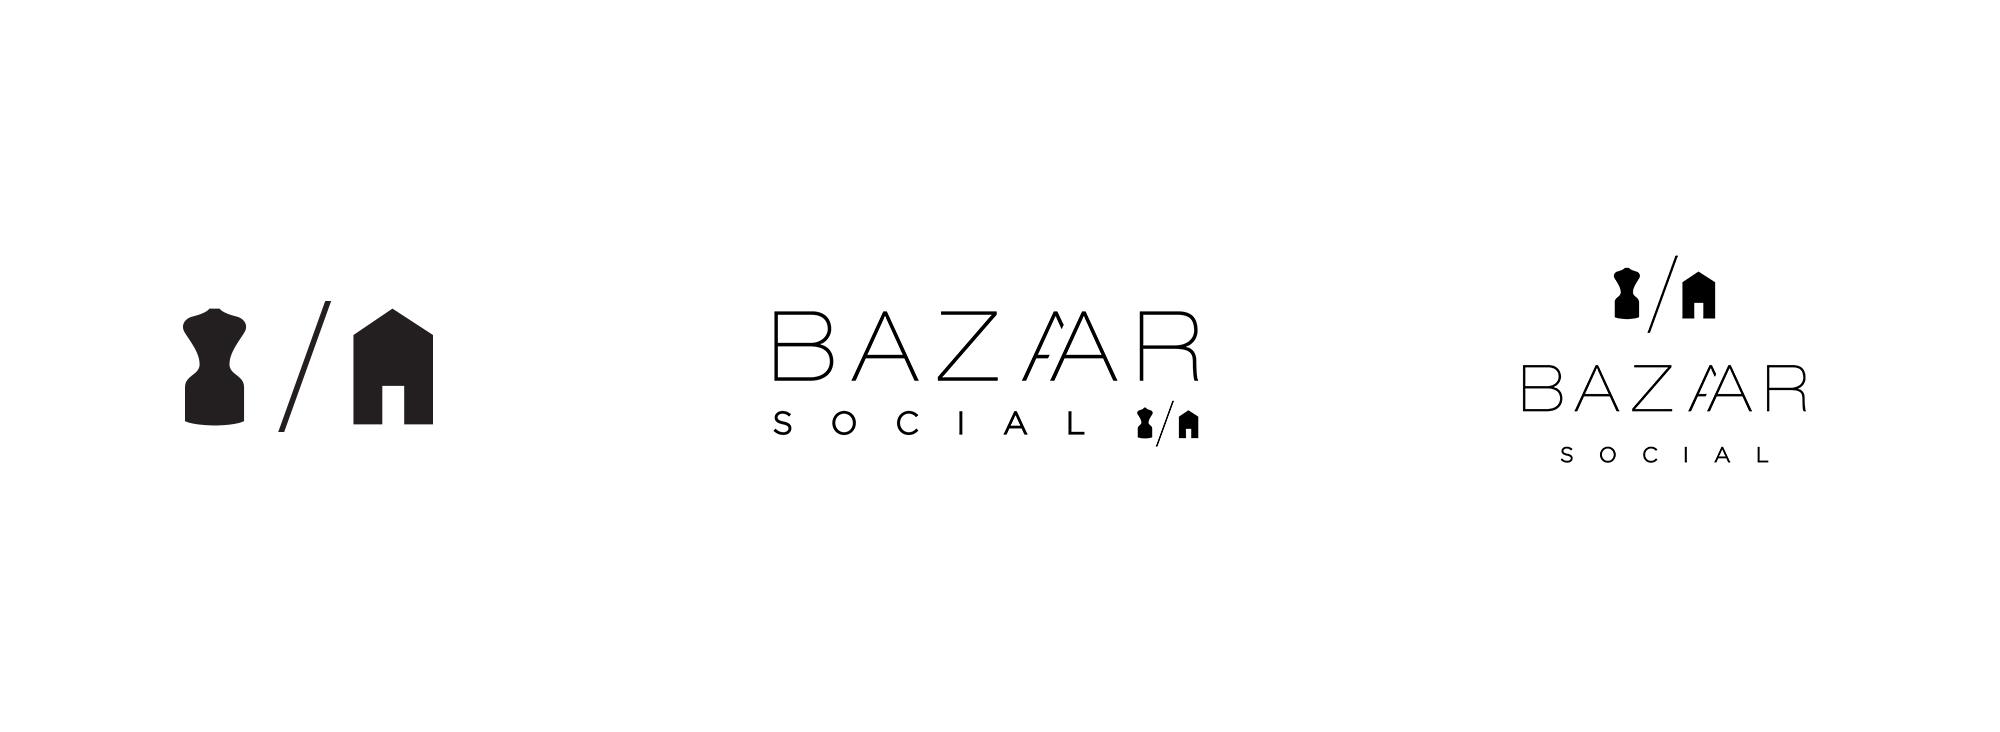 bazaar logos